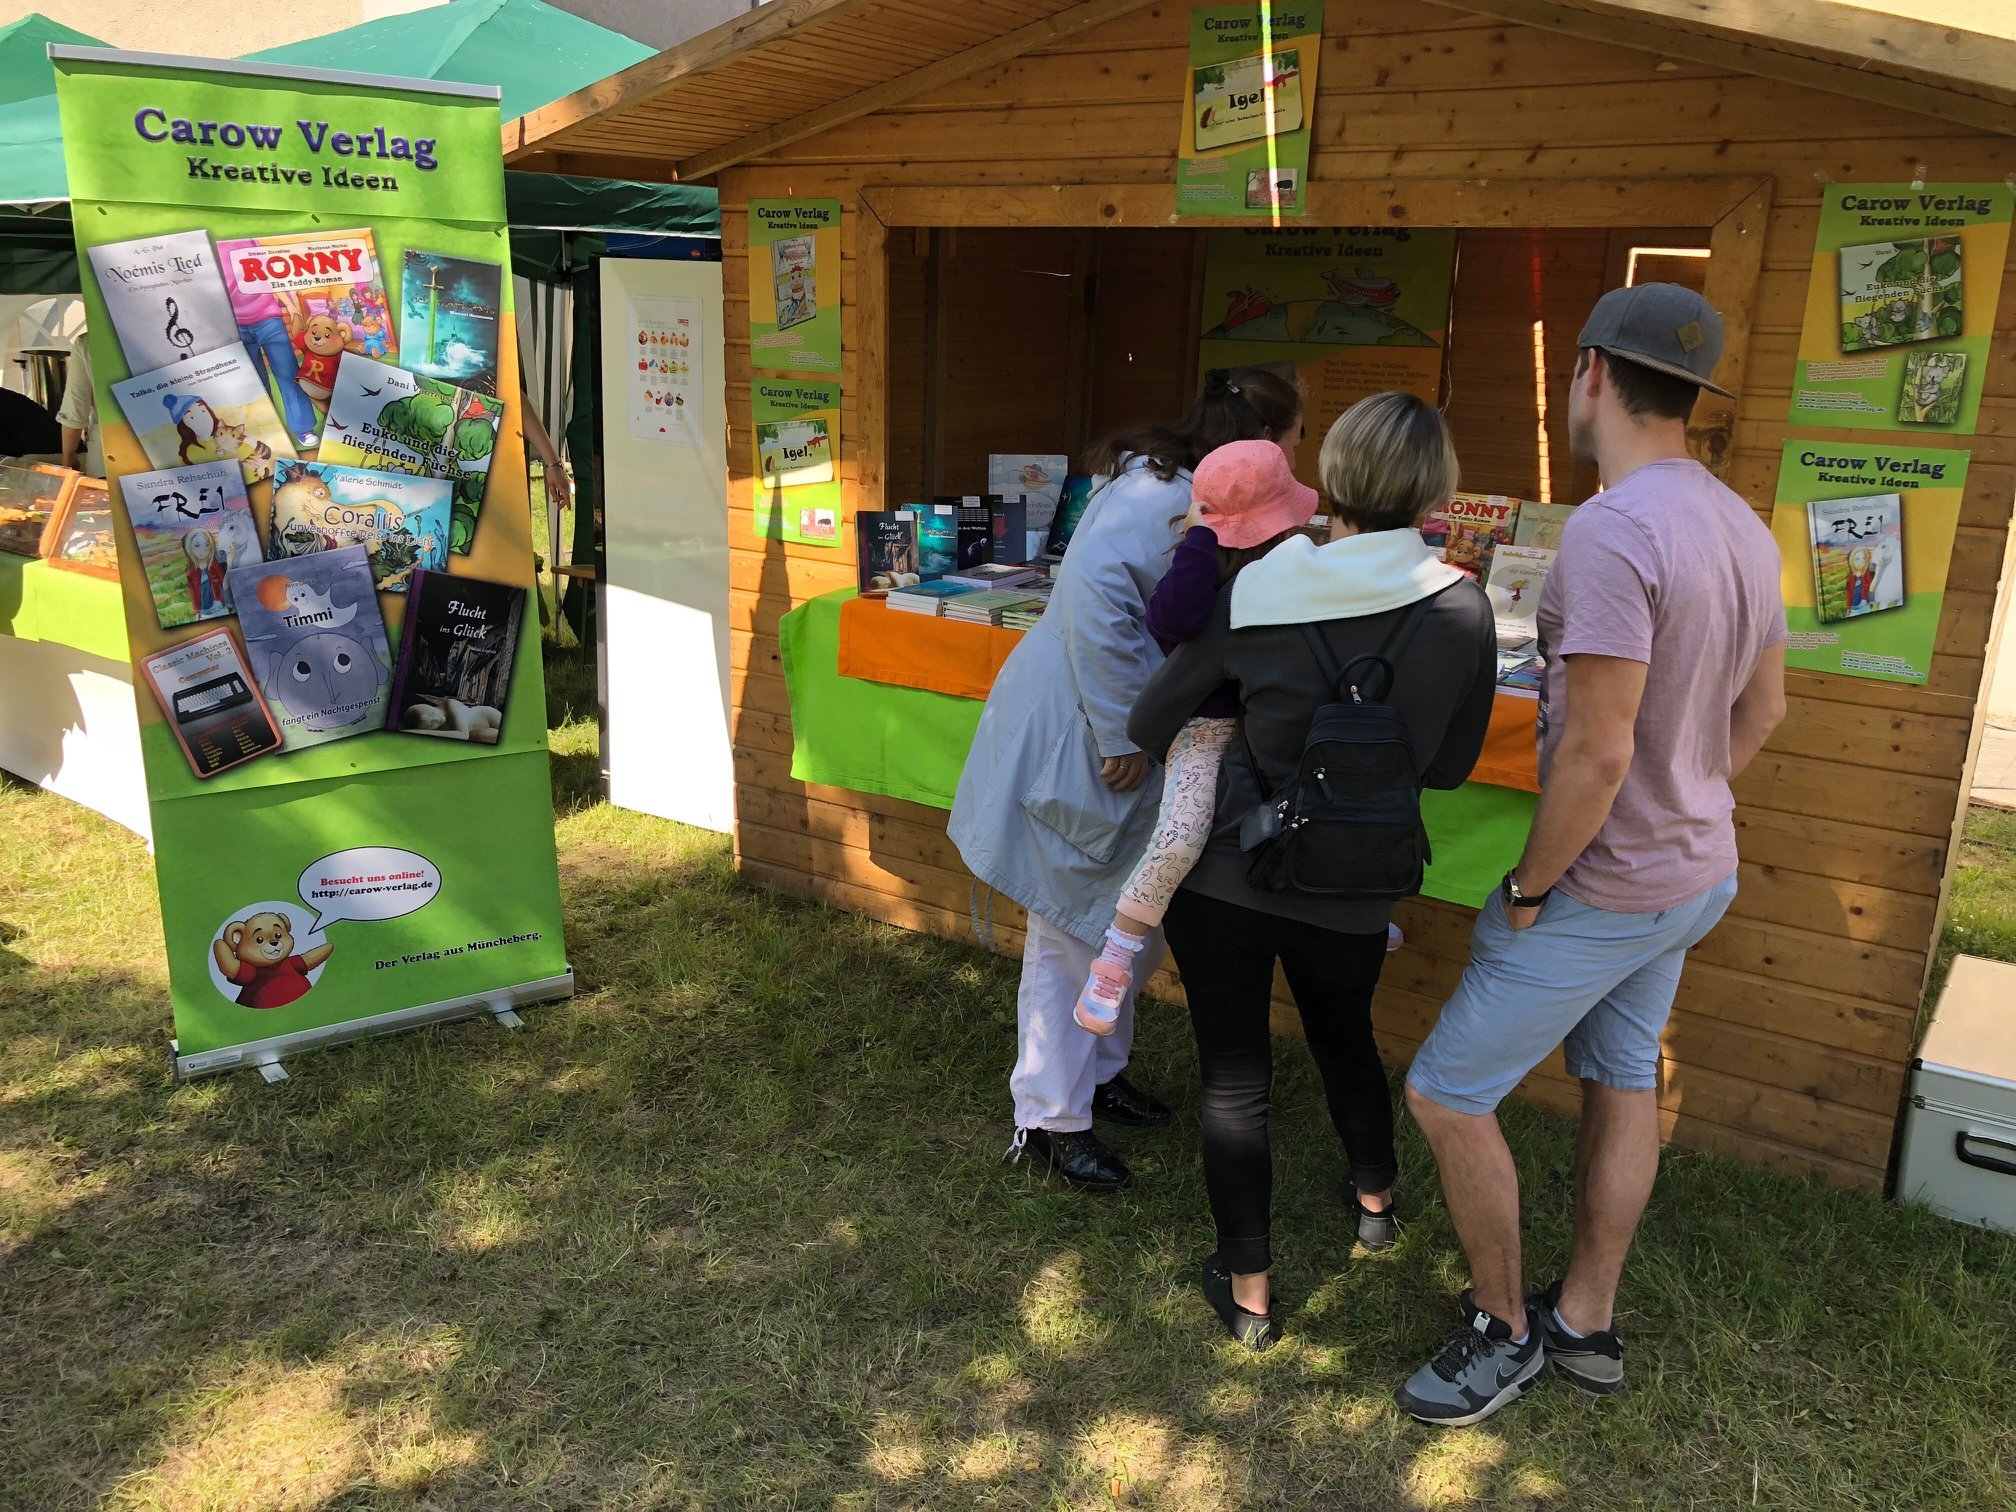 https://carow-verlag.de/news/images/kaiserbergfest.jpg